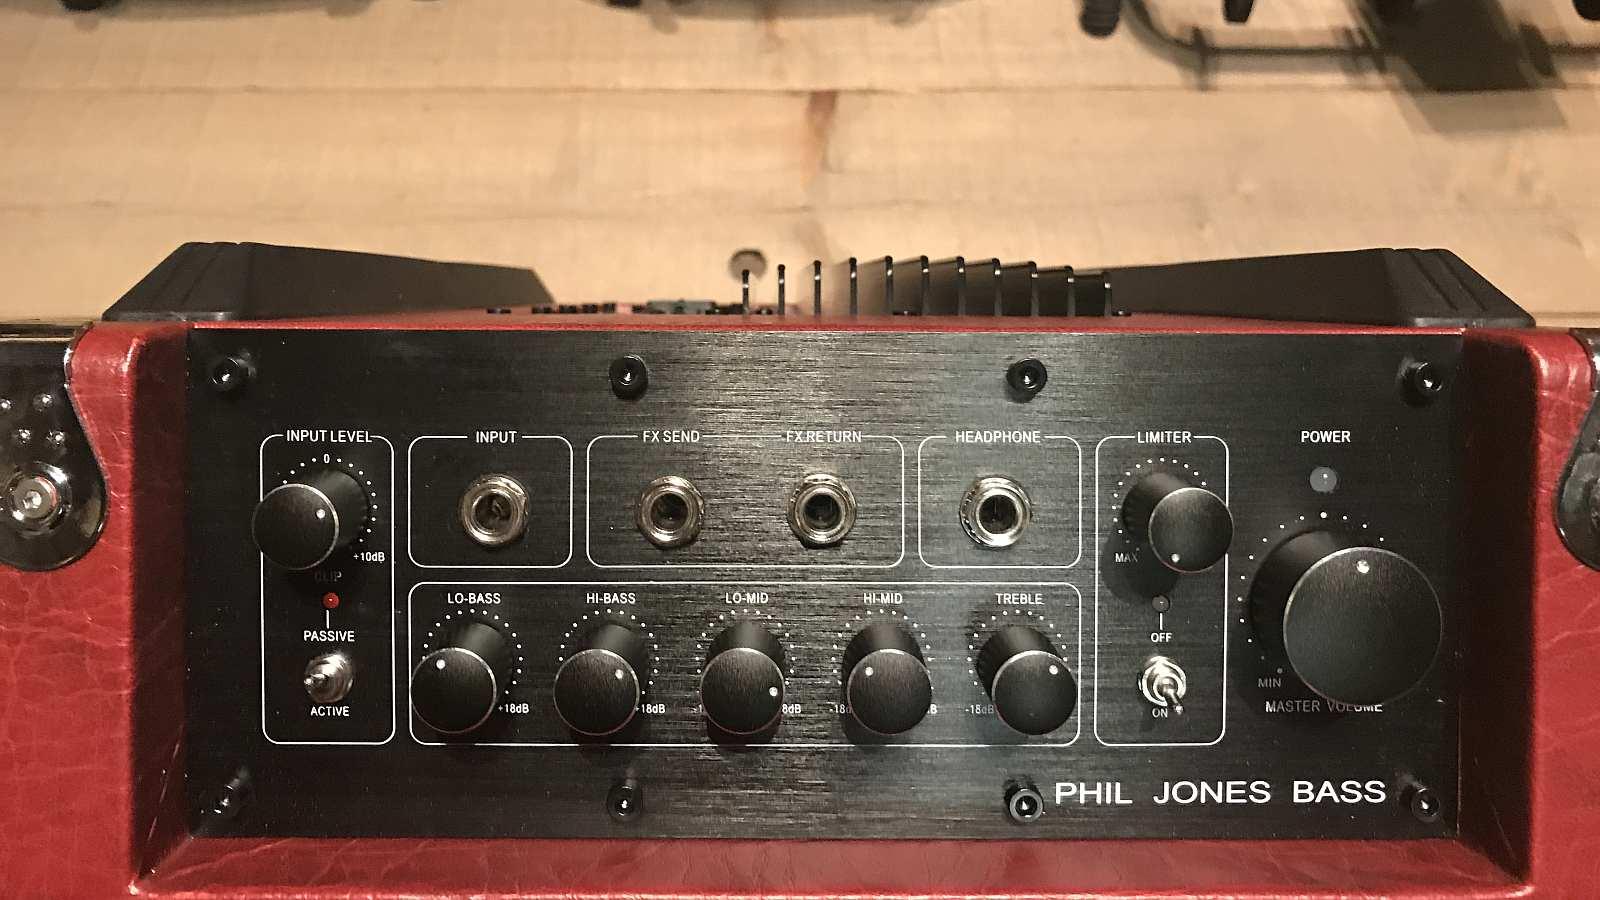 Phil Jones Flightcase BG300 Red Bass Combo